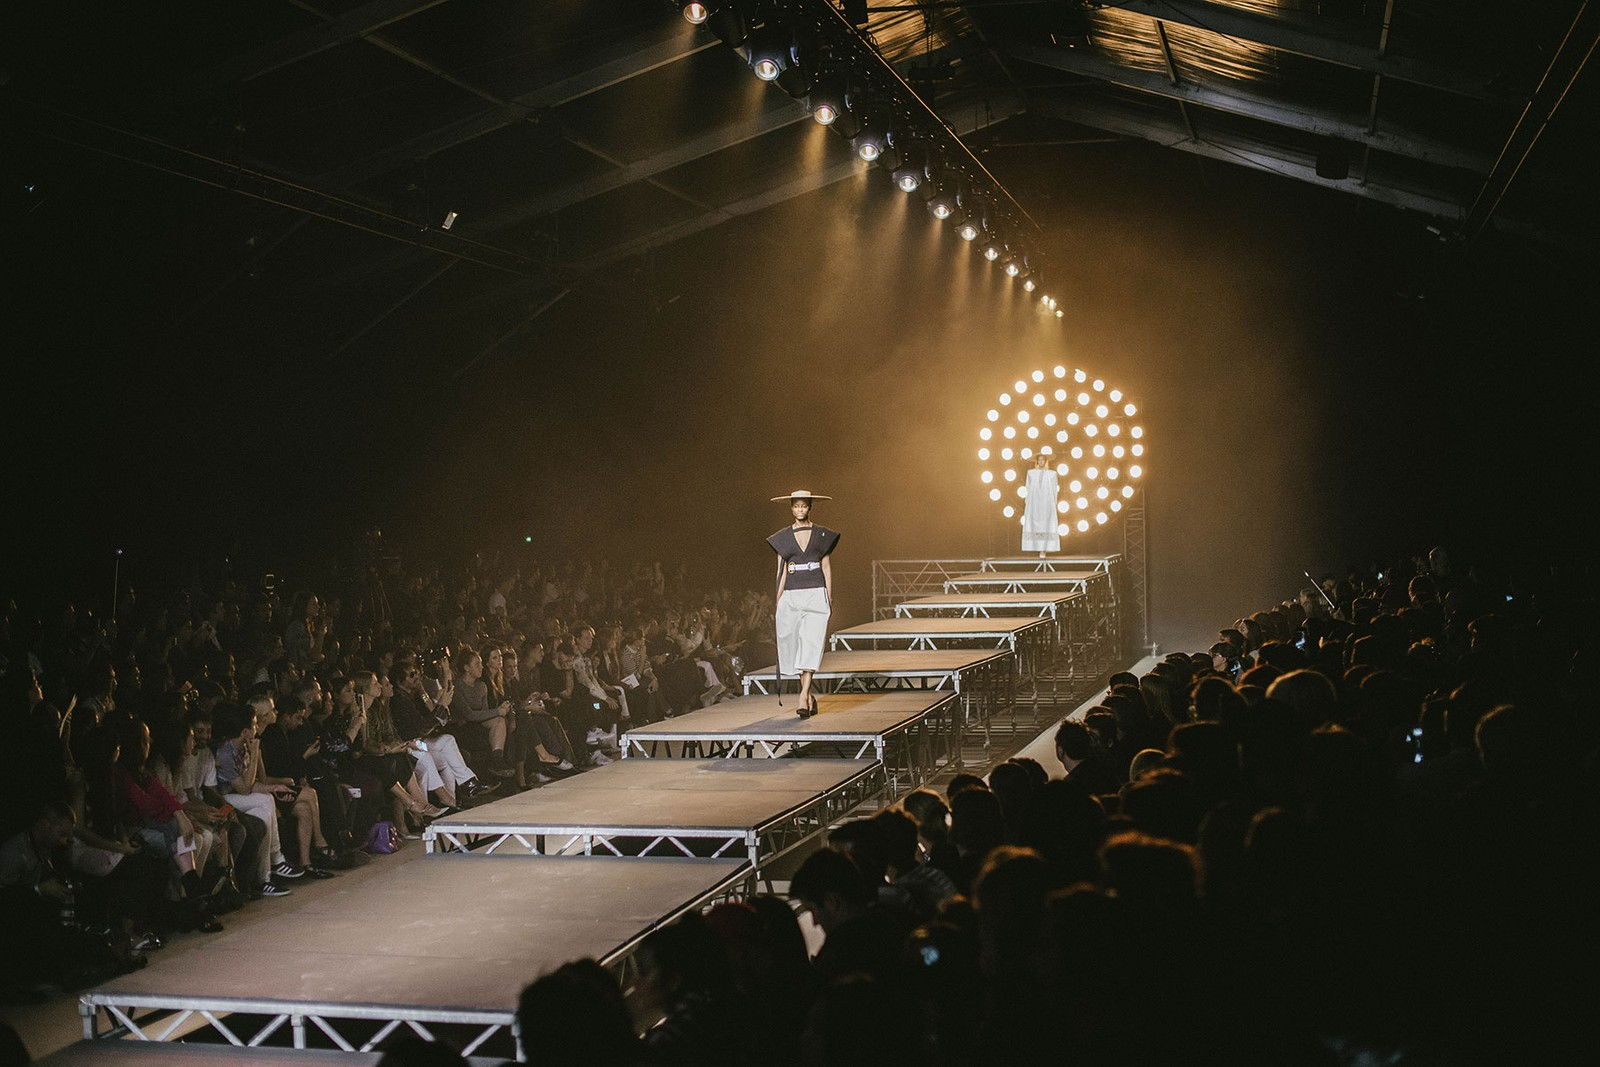 Jacquemus Le Sac Chiquito Mini Micro Bag Handbag Kendall Jenner Kim Kardashian Rihanna Yellow Suede Spring Summer 2018